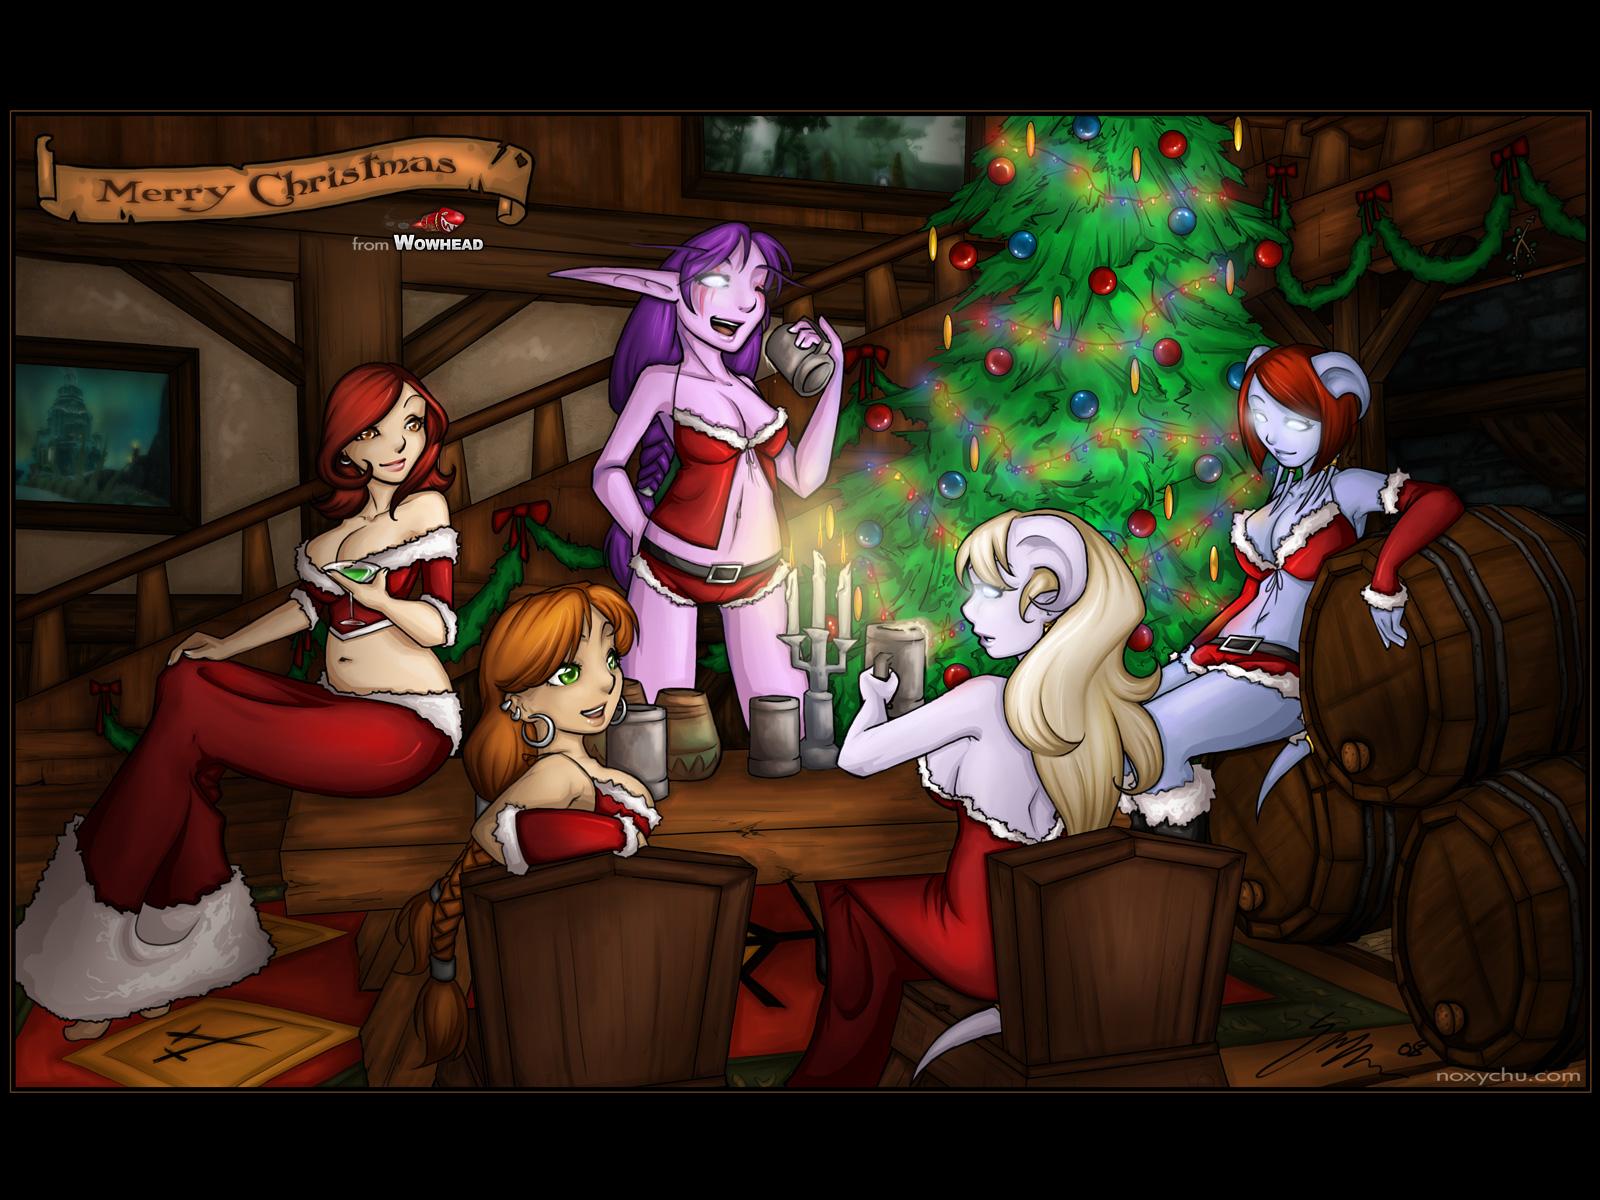 http://2.bp.blogspot.com/-HTwIvPDJ9Qk/TZkdOxVb6dI/AAAAAAAAAgQ/gUgz4AtG-8k/s1600/2008-christmas-1600x1200.jpg